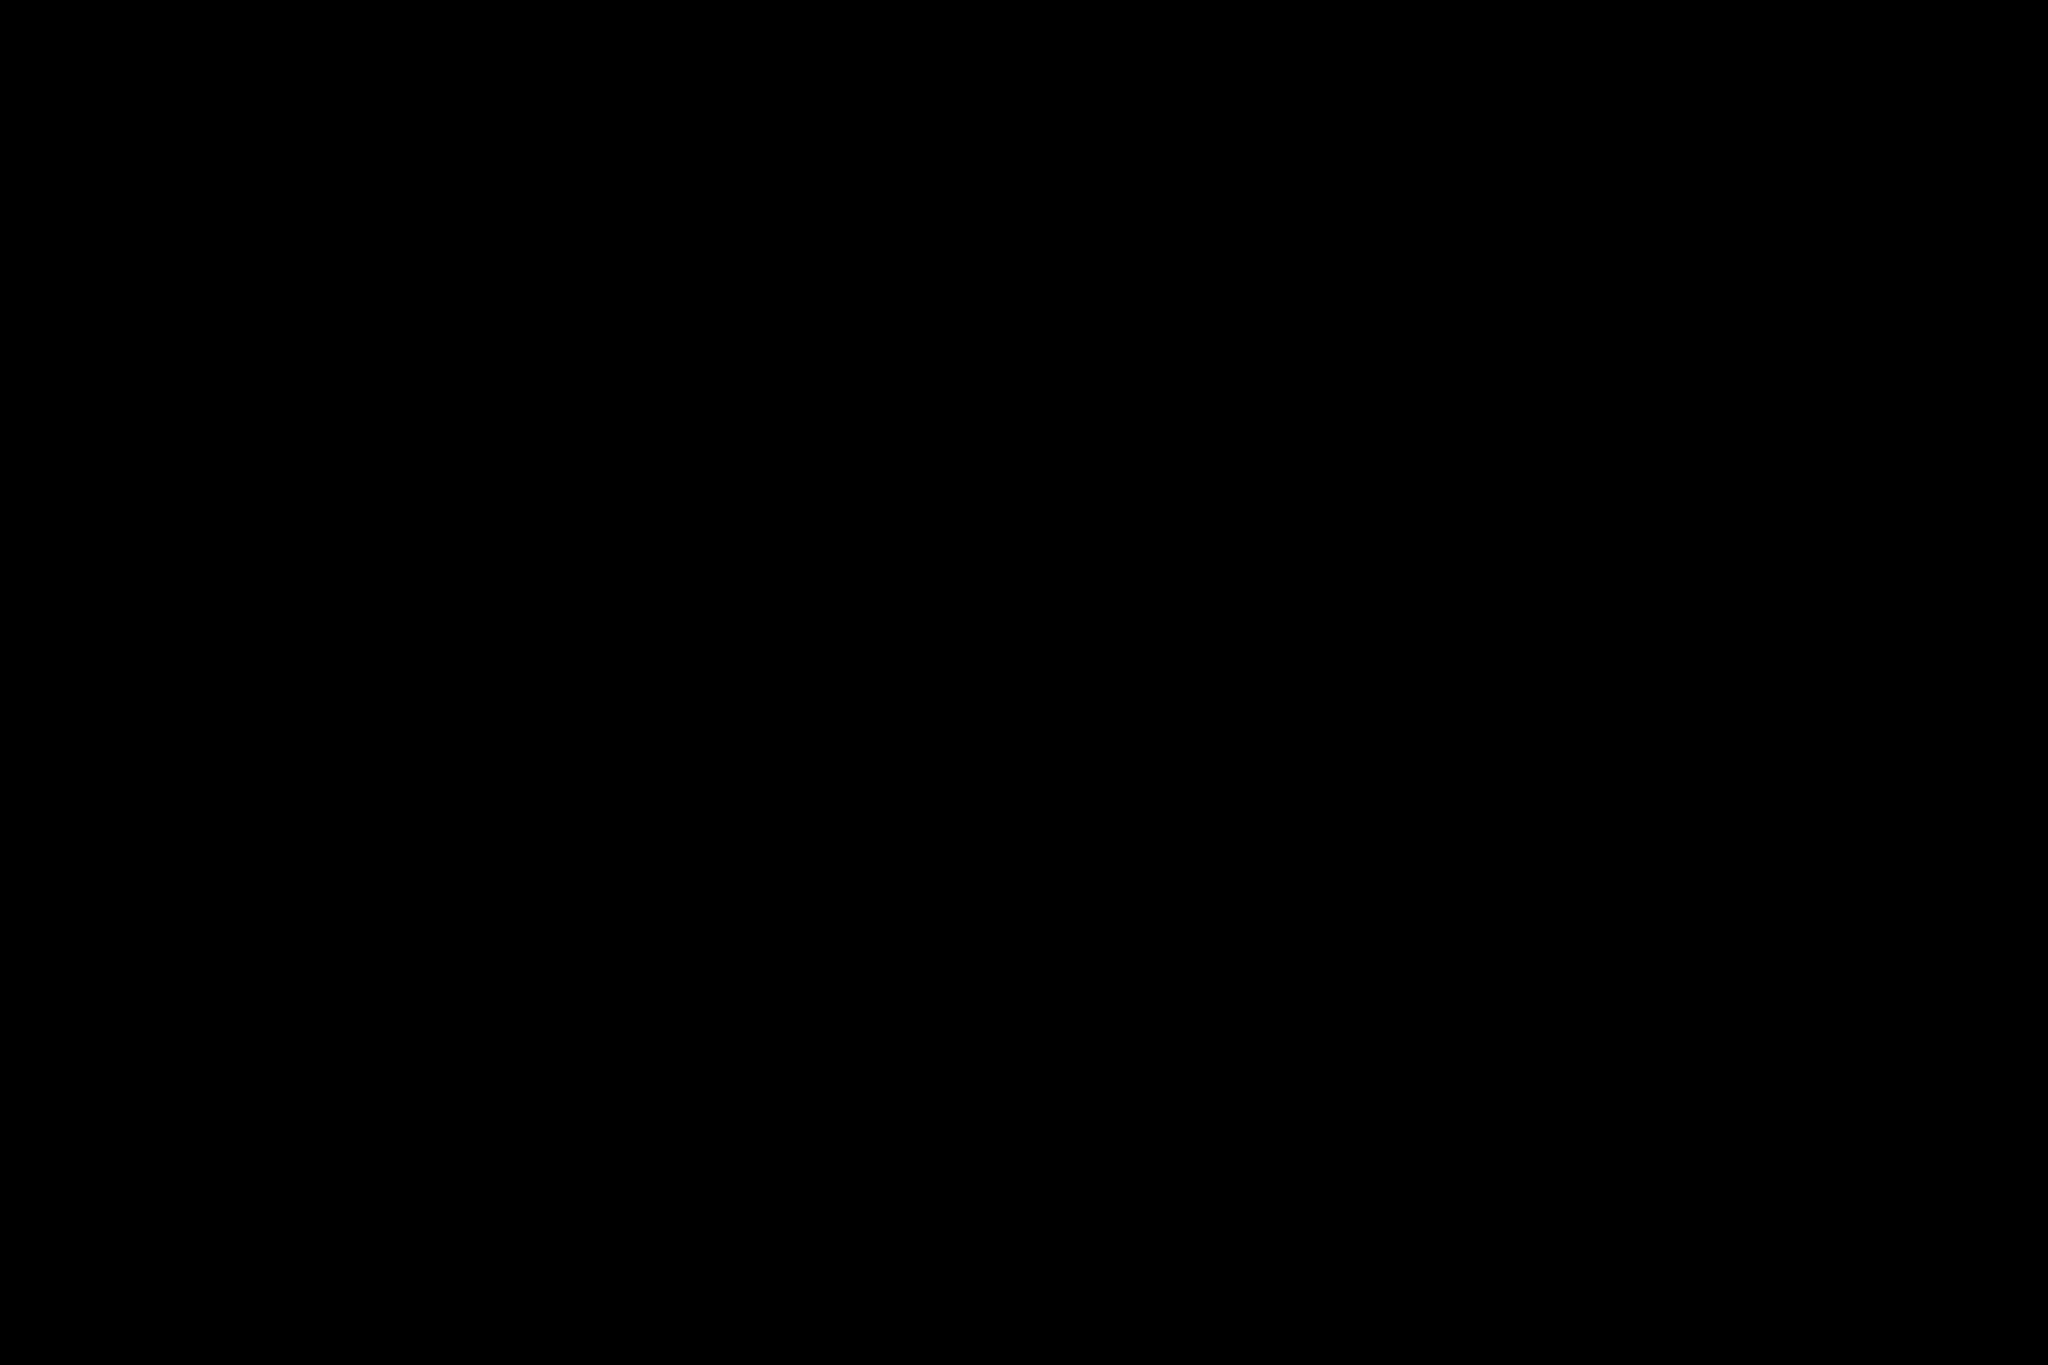 07303968